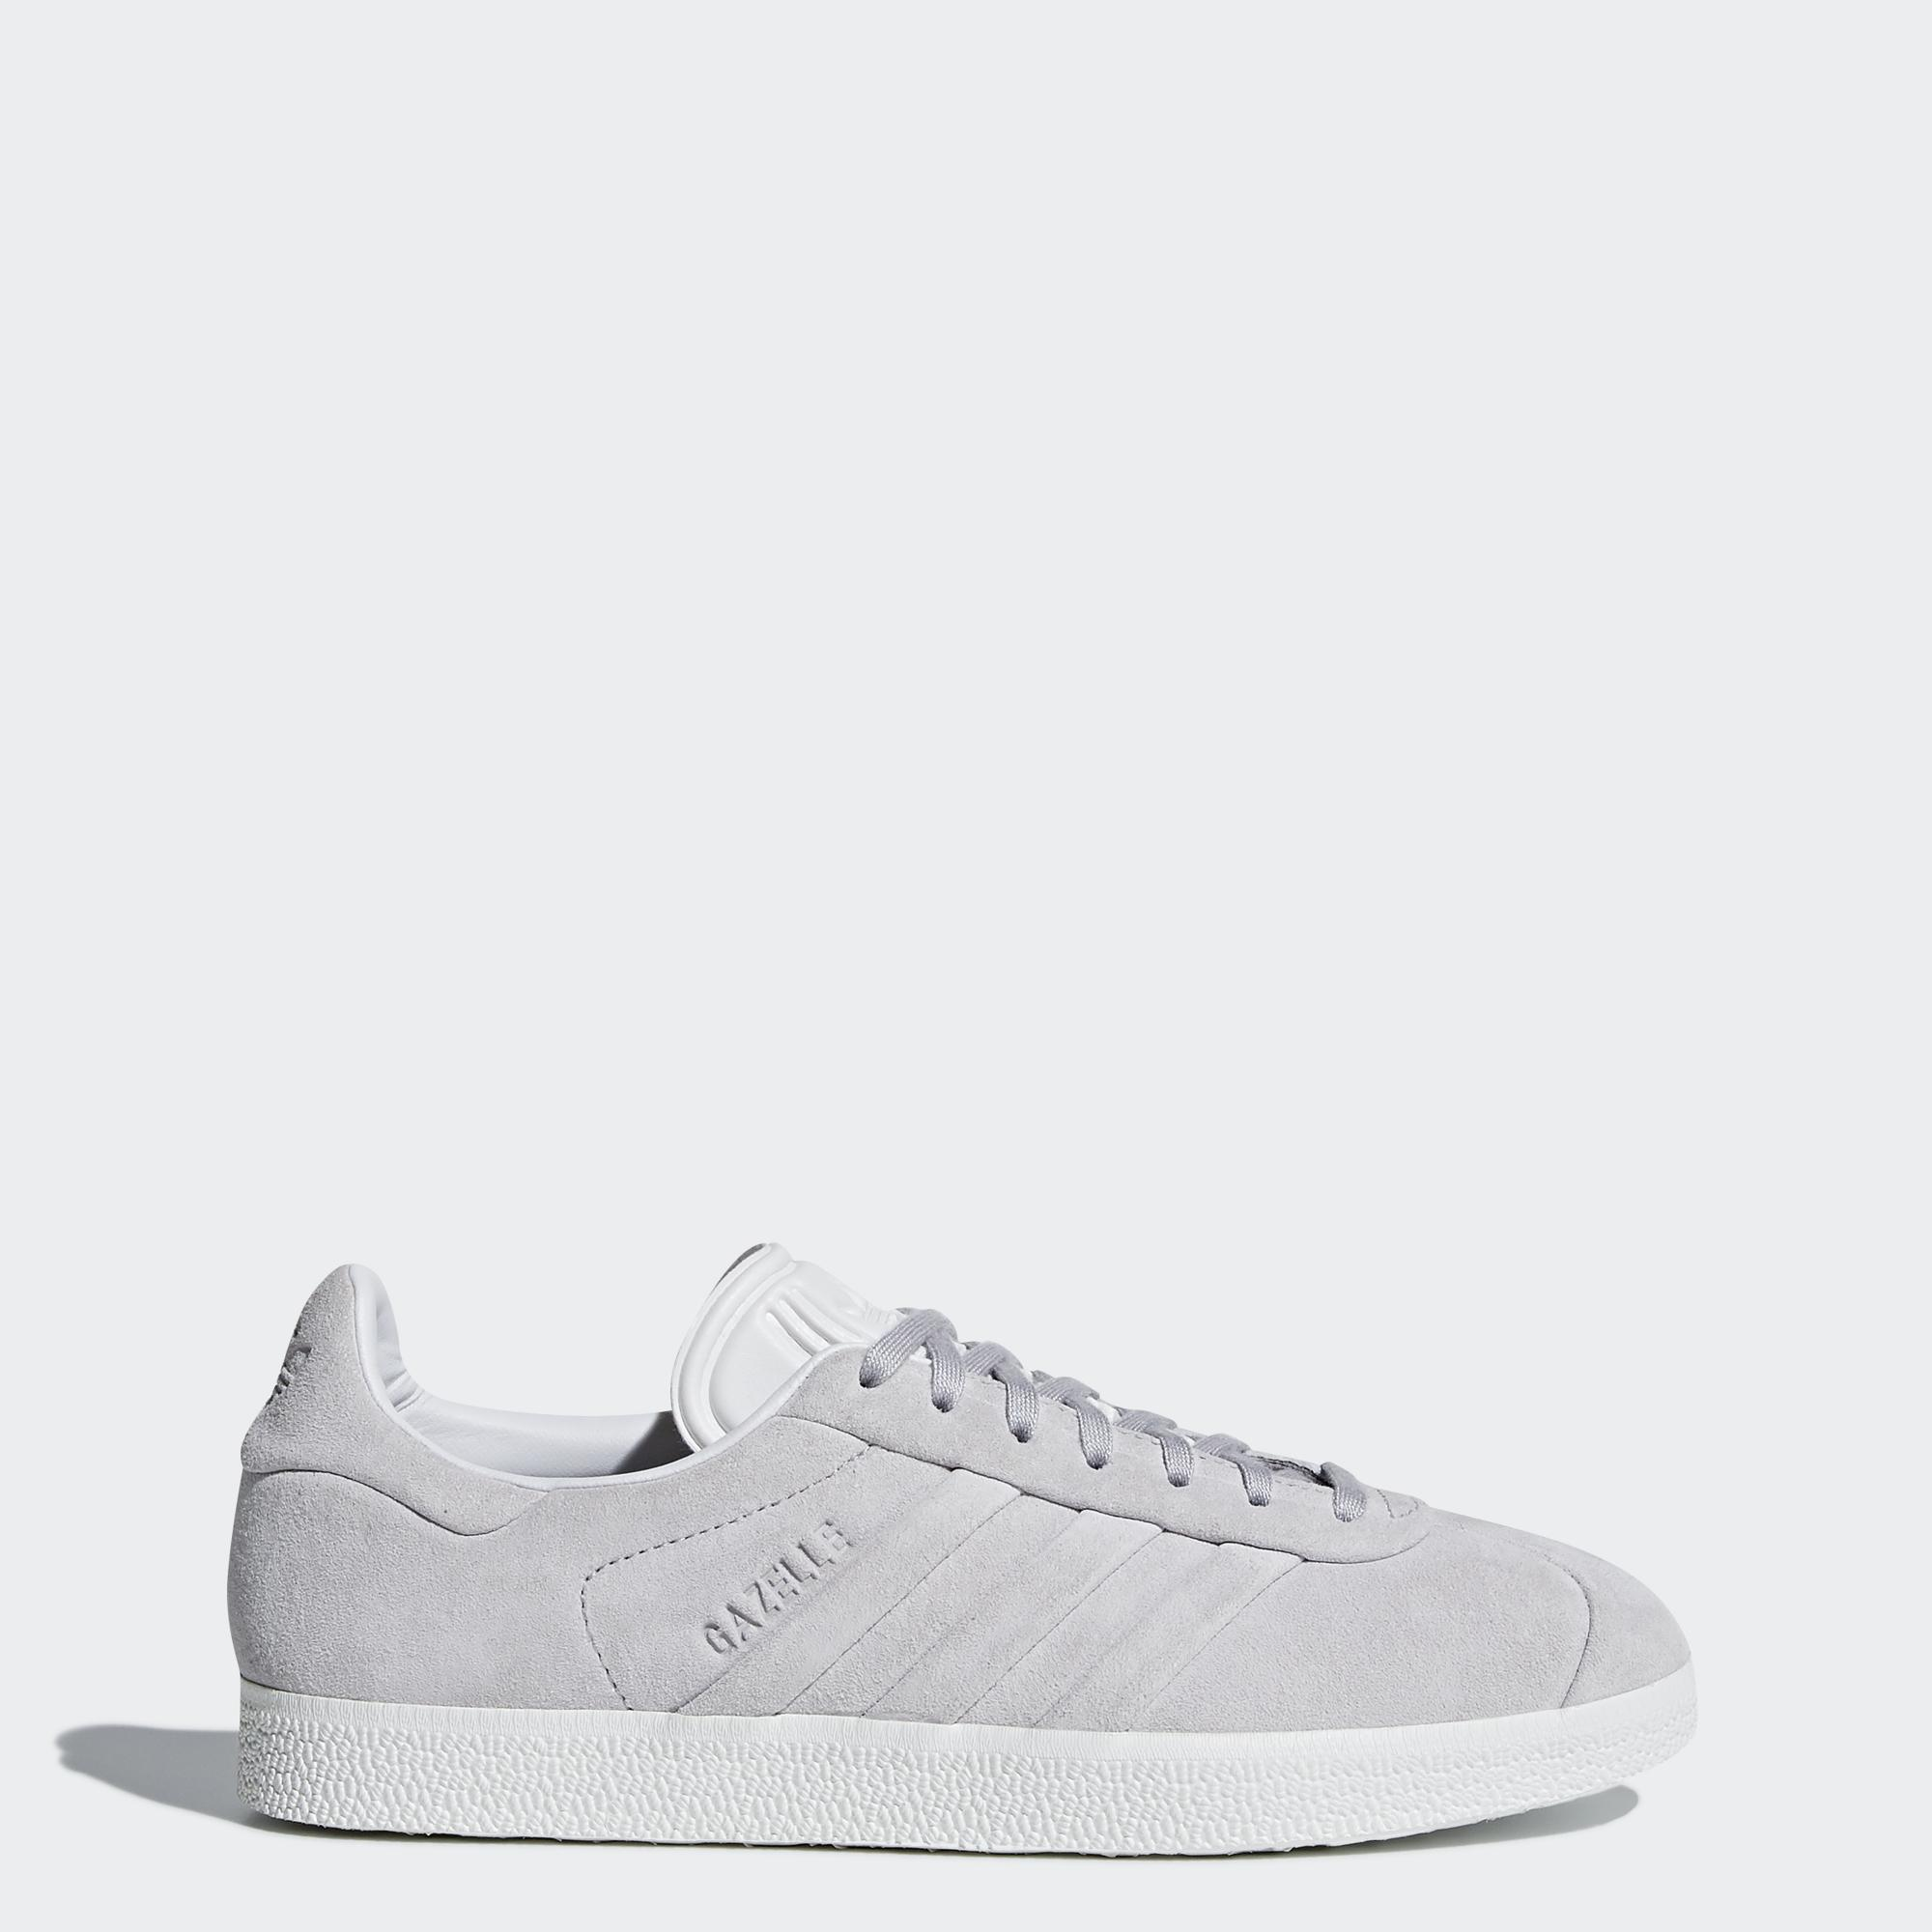 Adidas Originals Shoes Gazelle Stitch And Turn  Woman